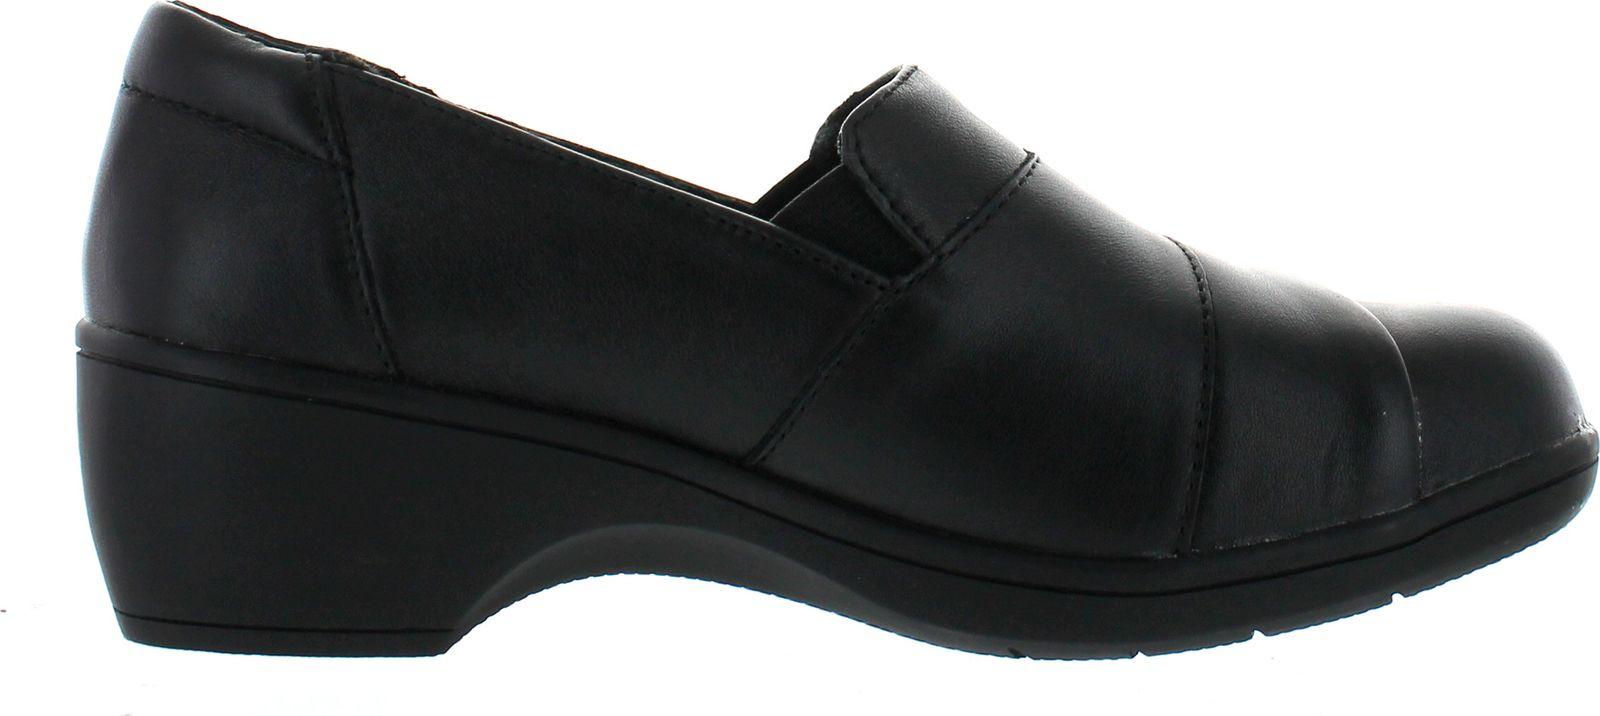 Galerry skechers dress shoes women